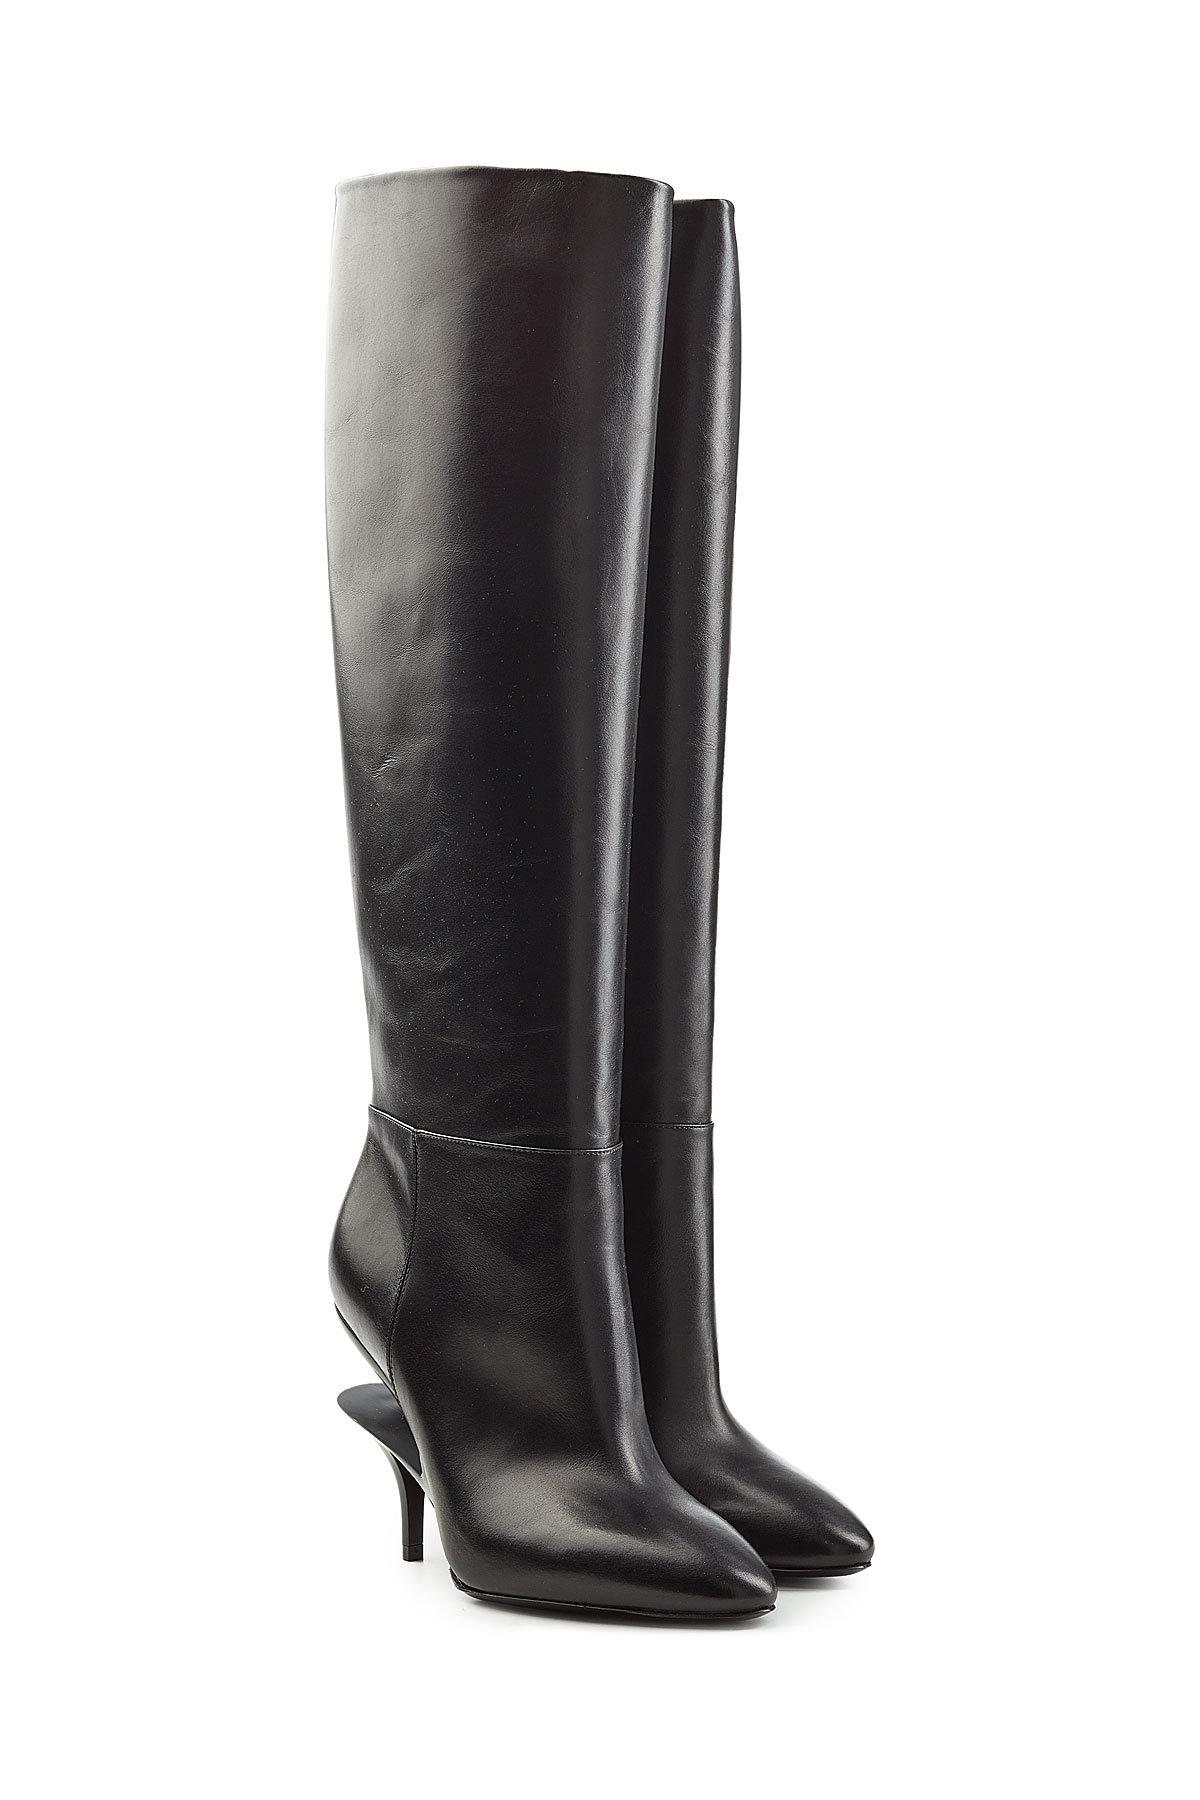 Maison Margiela Suede Knee Boots with Buttons Gr. EU 38.5 7Yhu1F